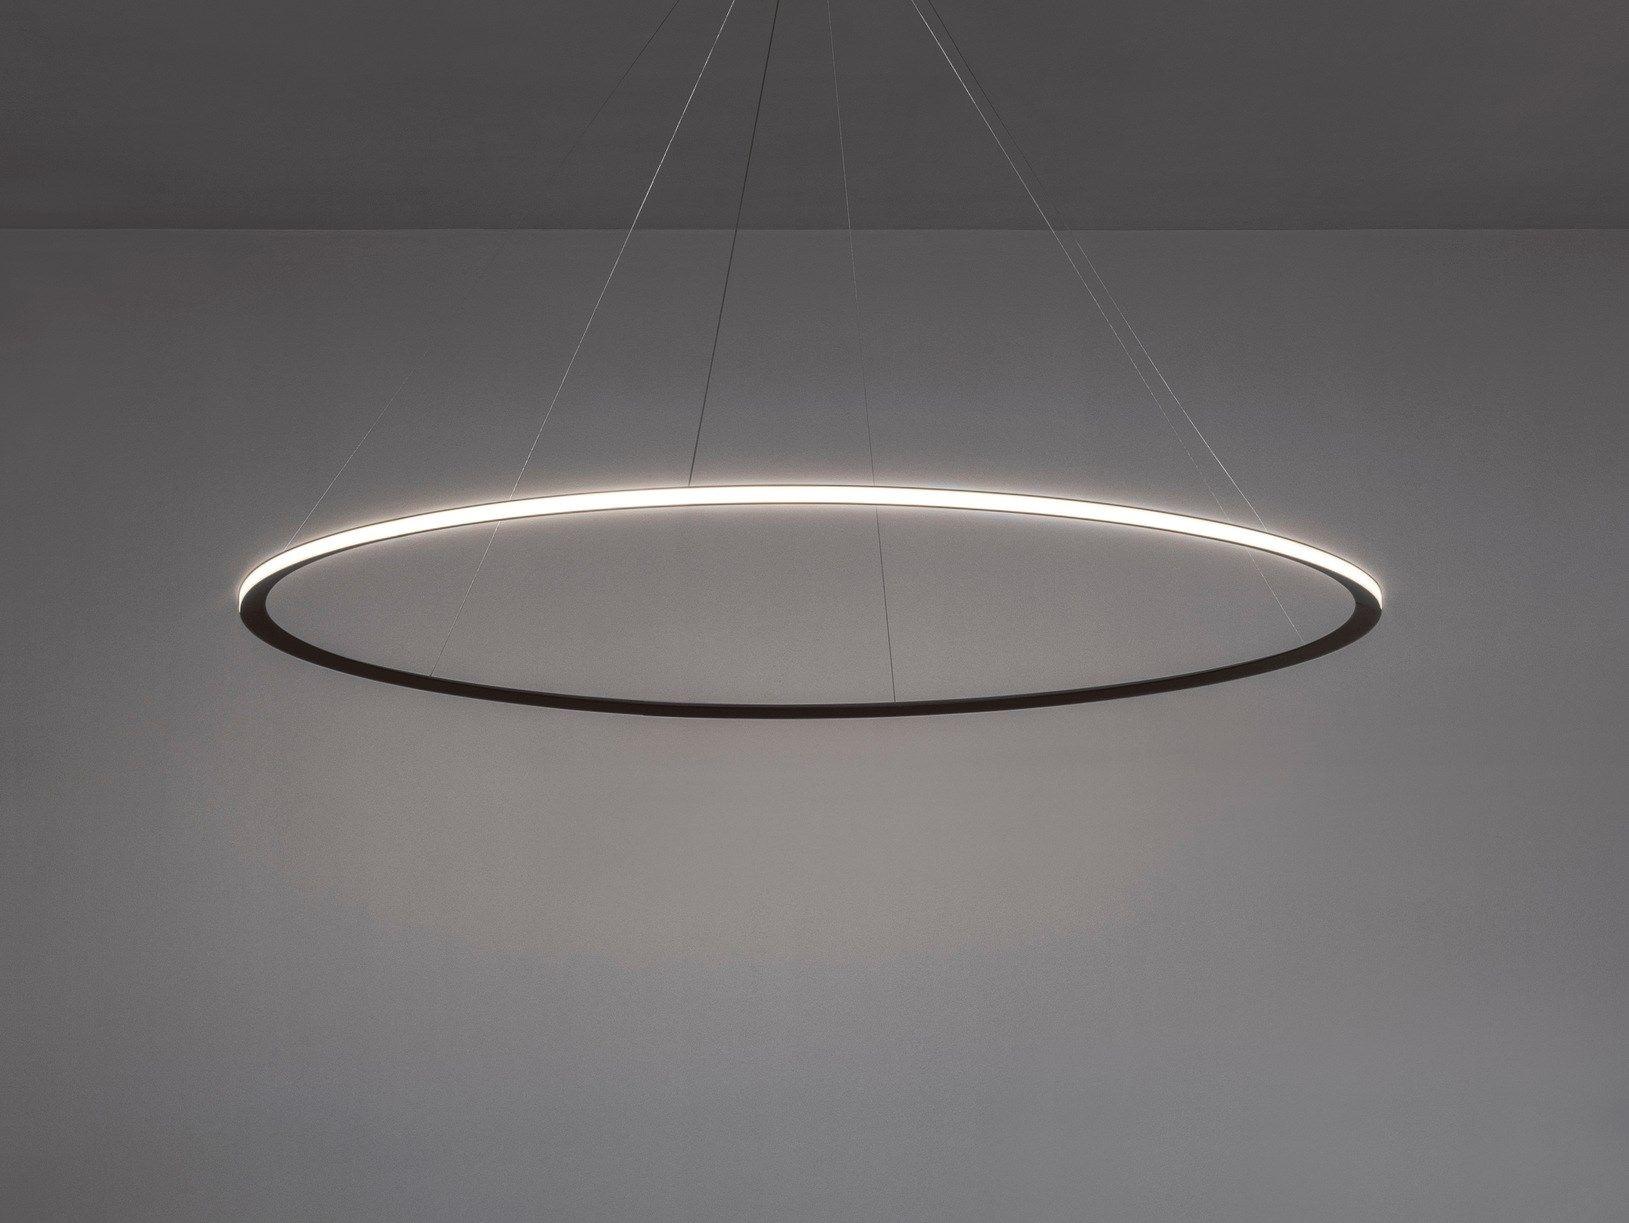 Lampade Sospese A Led.Lampada A Sospensione A Led A Luce Indiretta In Alluminio